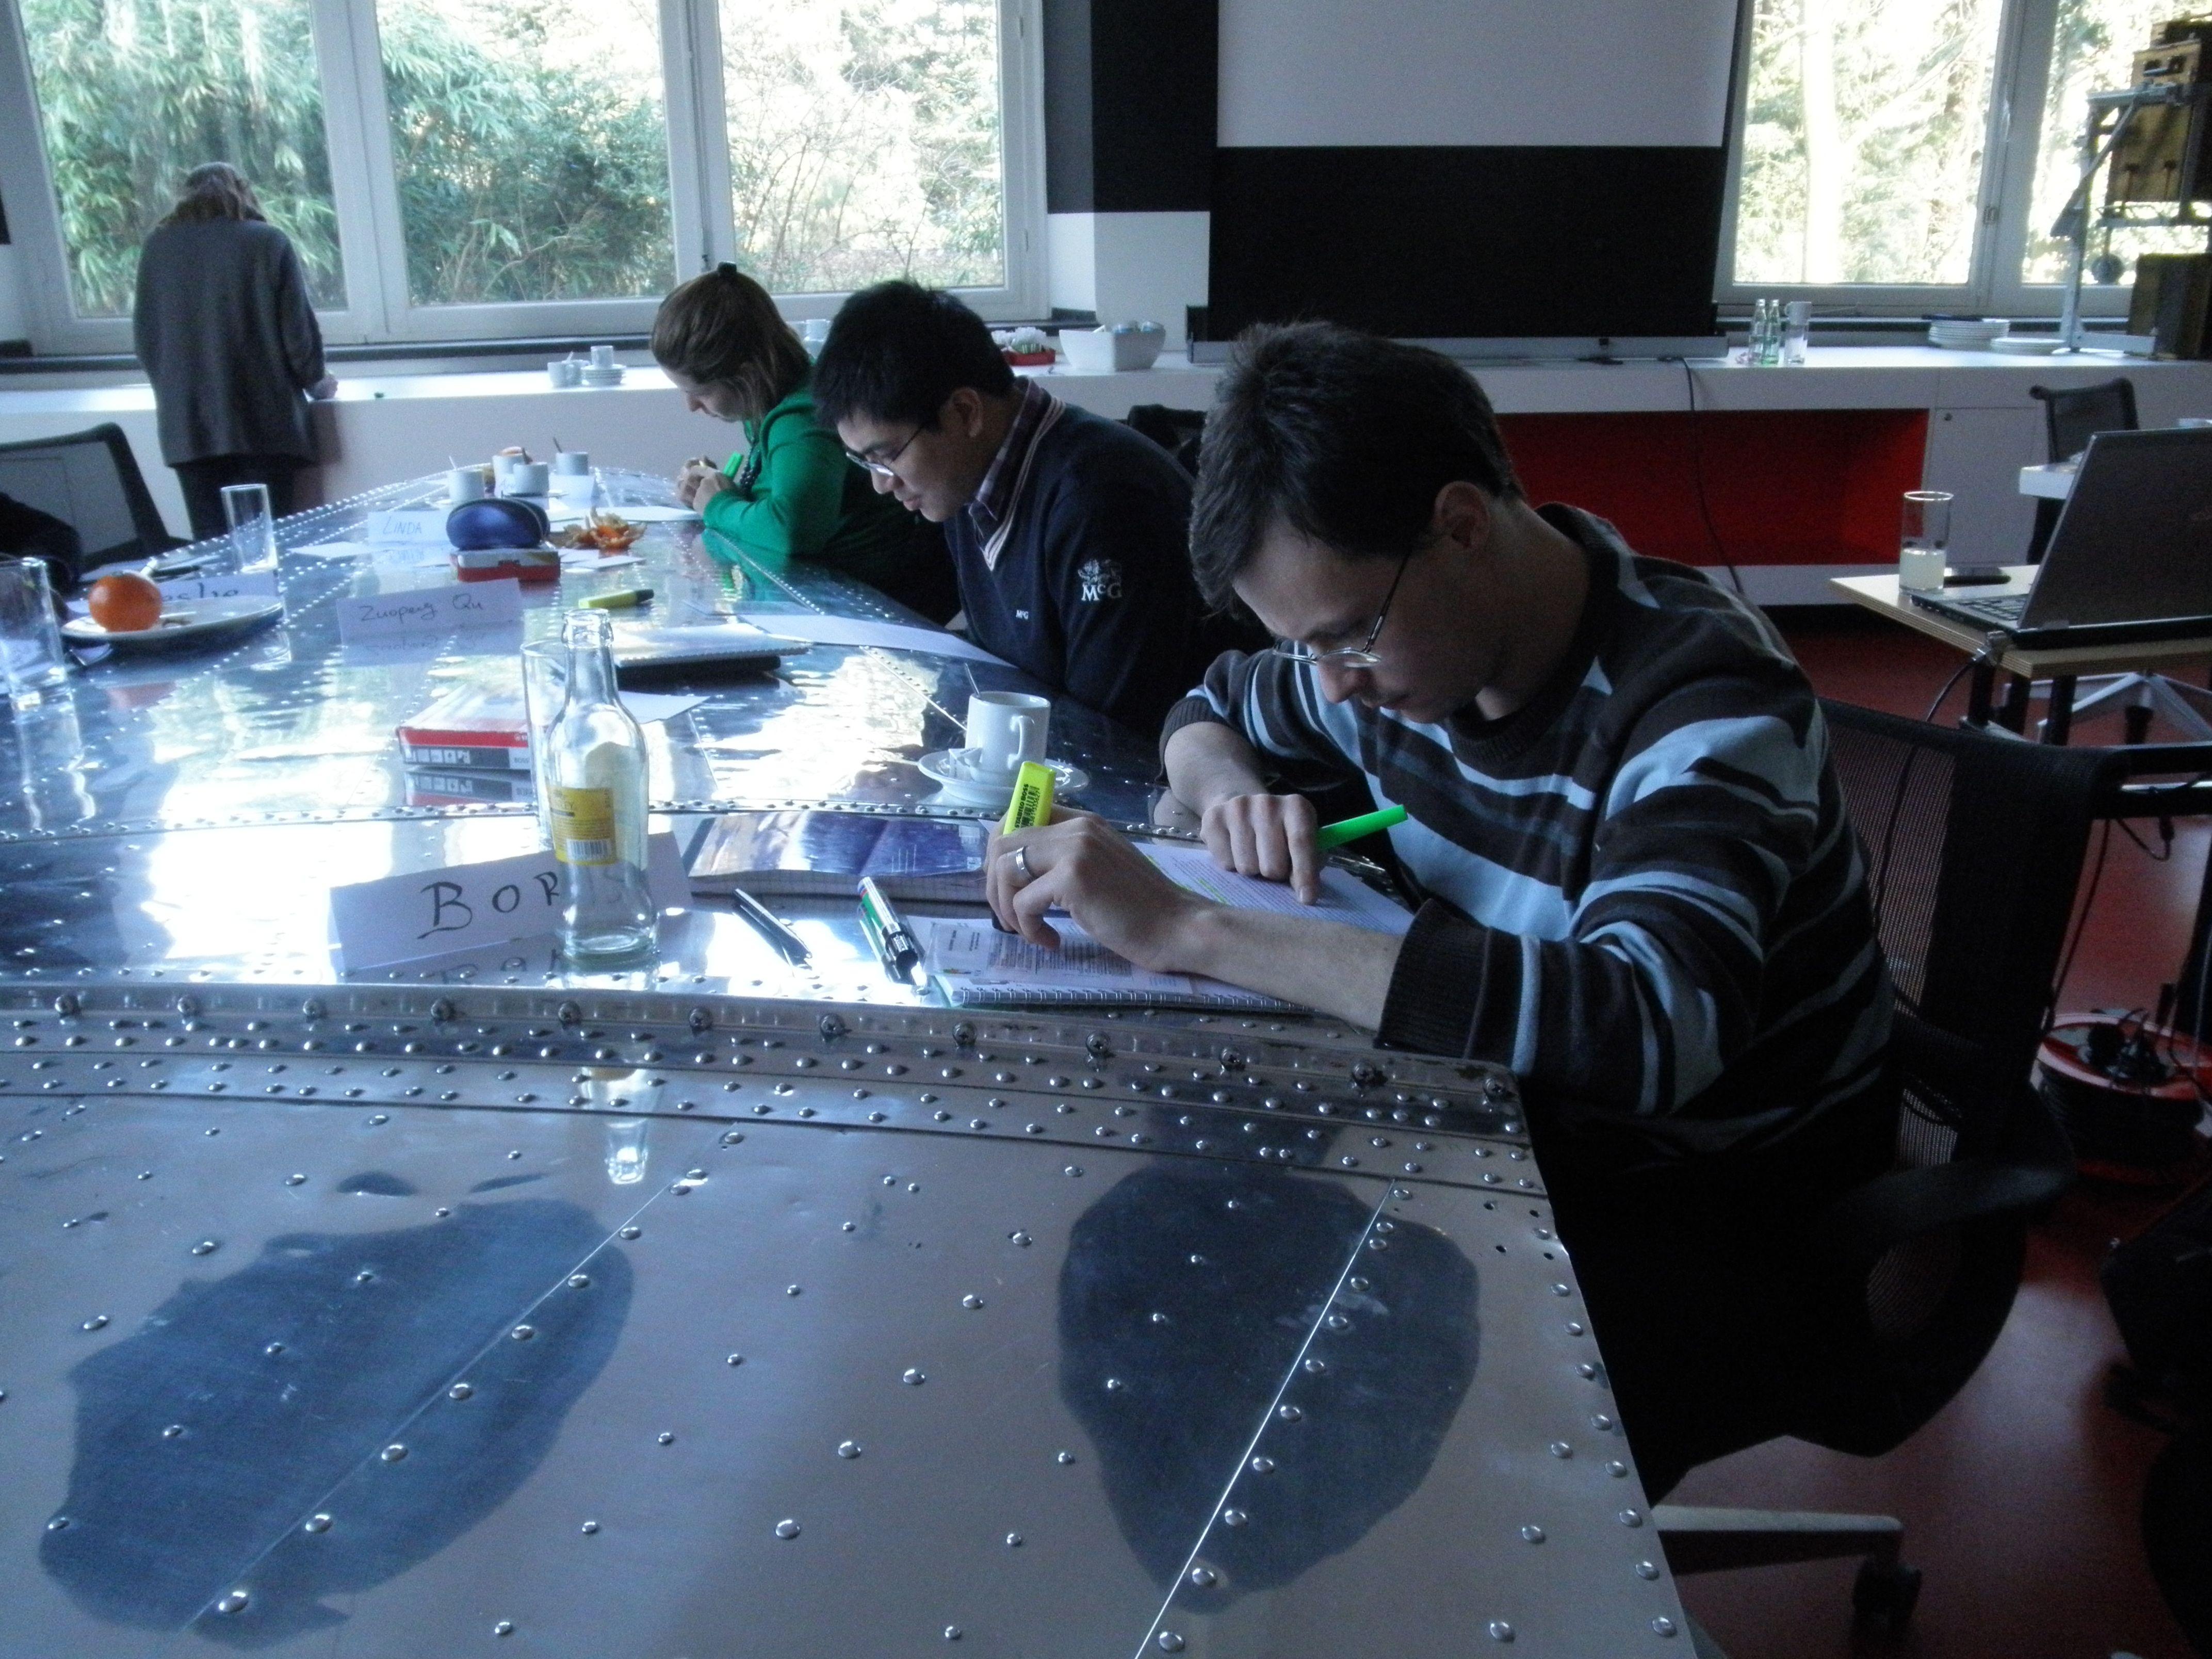 Technical University Delft